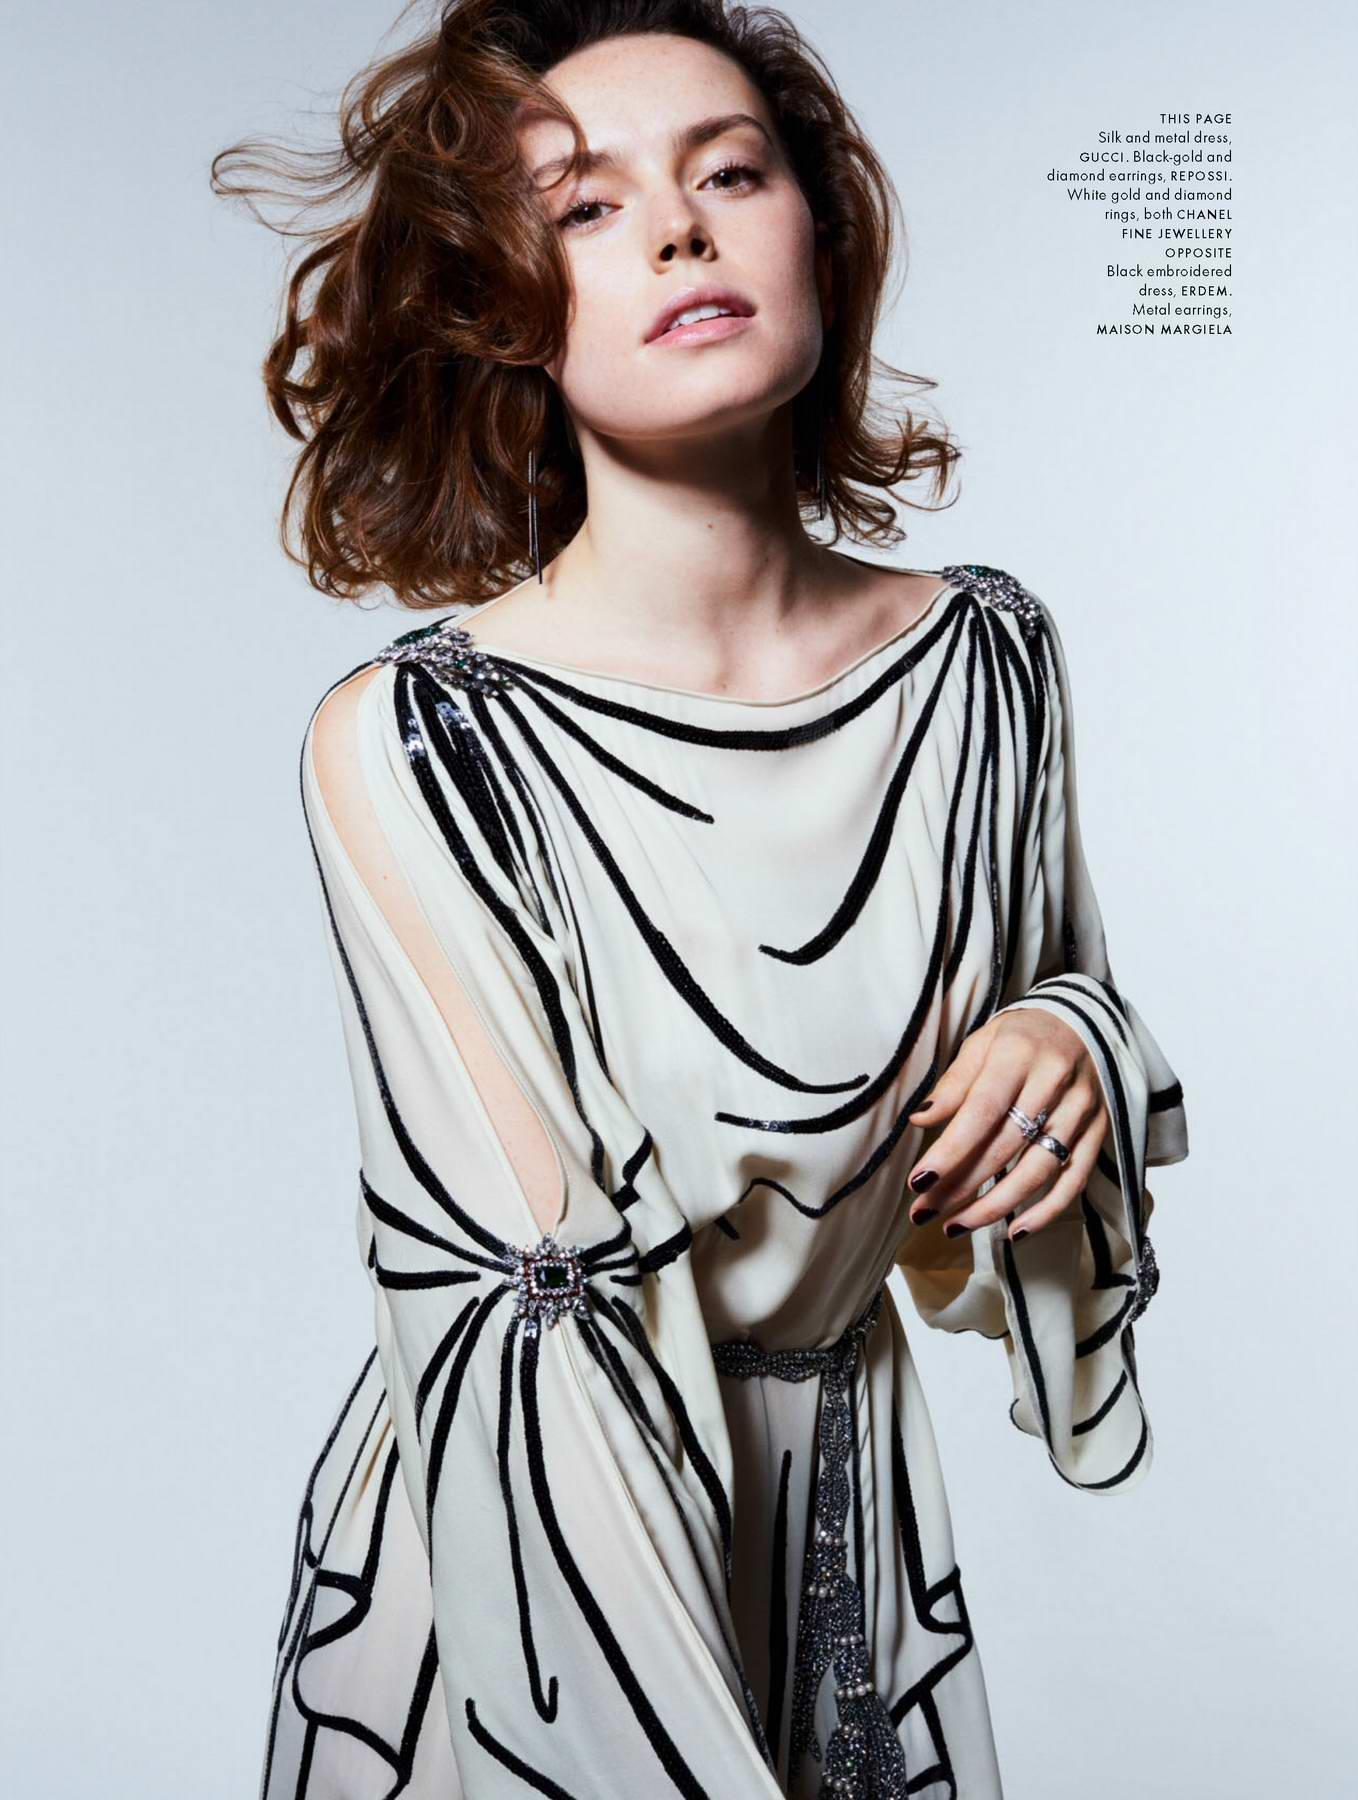 Daisy Ridley in Elle Magazine, UK - December 2017